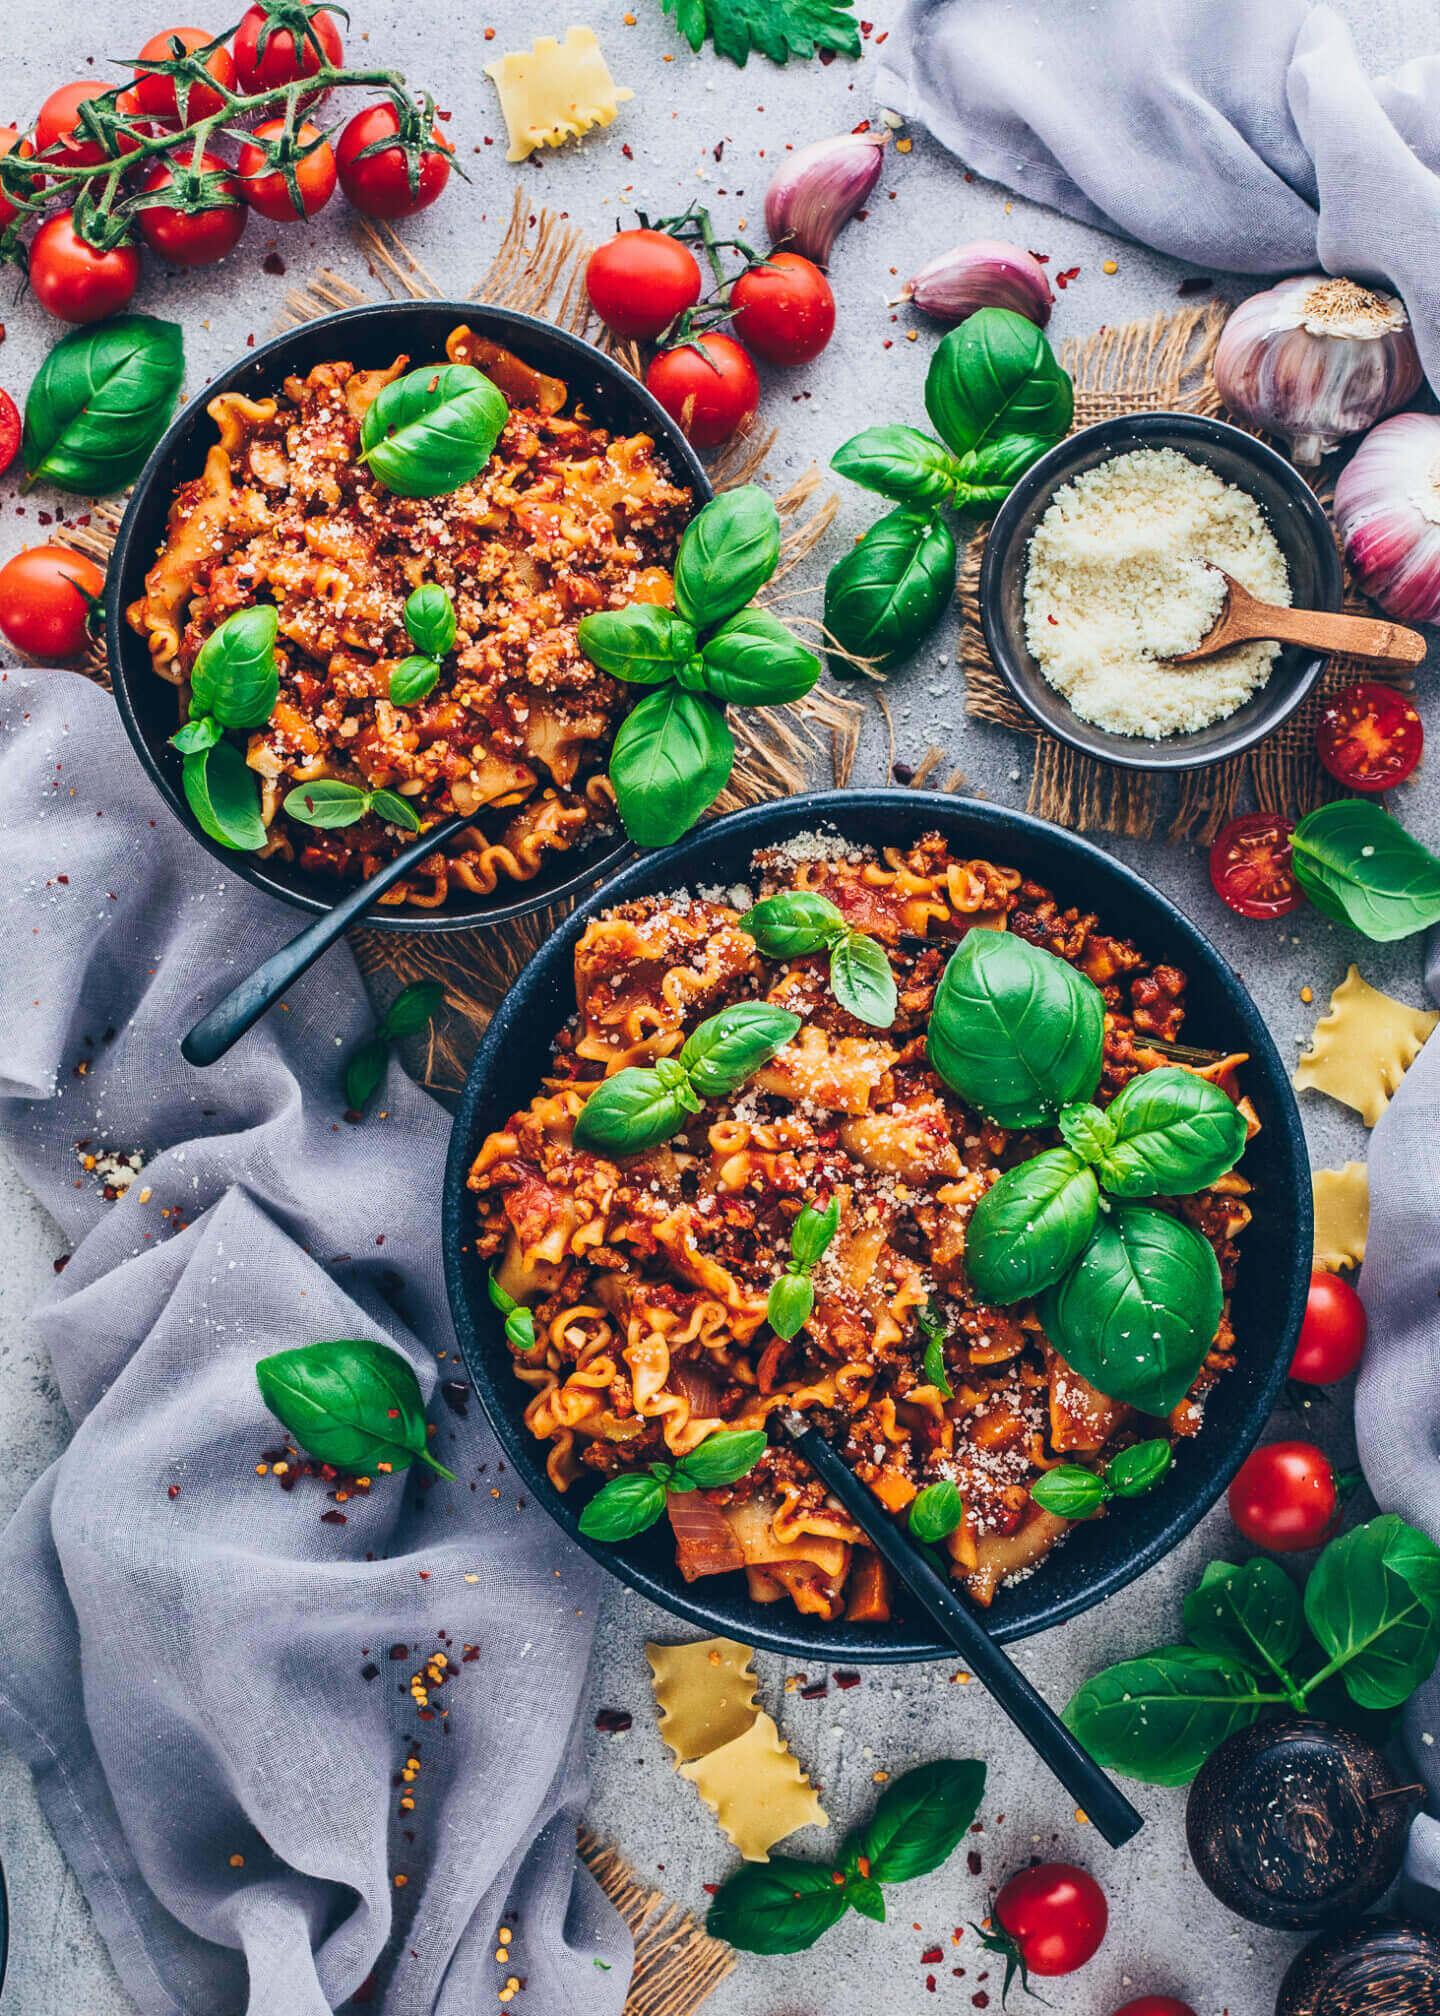 Vegan Lasagna Soup with cashew parmesan, tomatoes, and basil